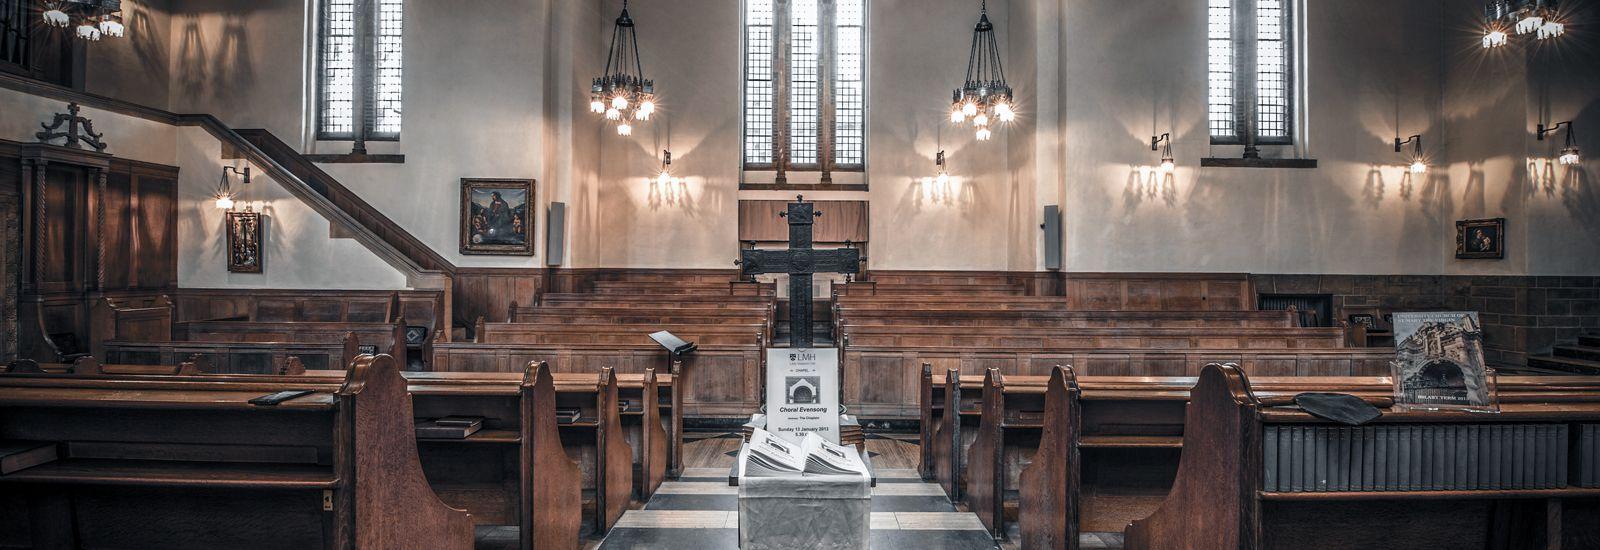 Inside LMH's Chapel